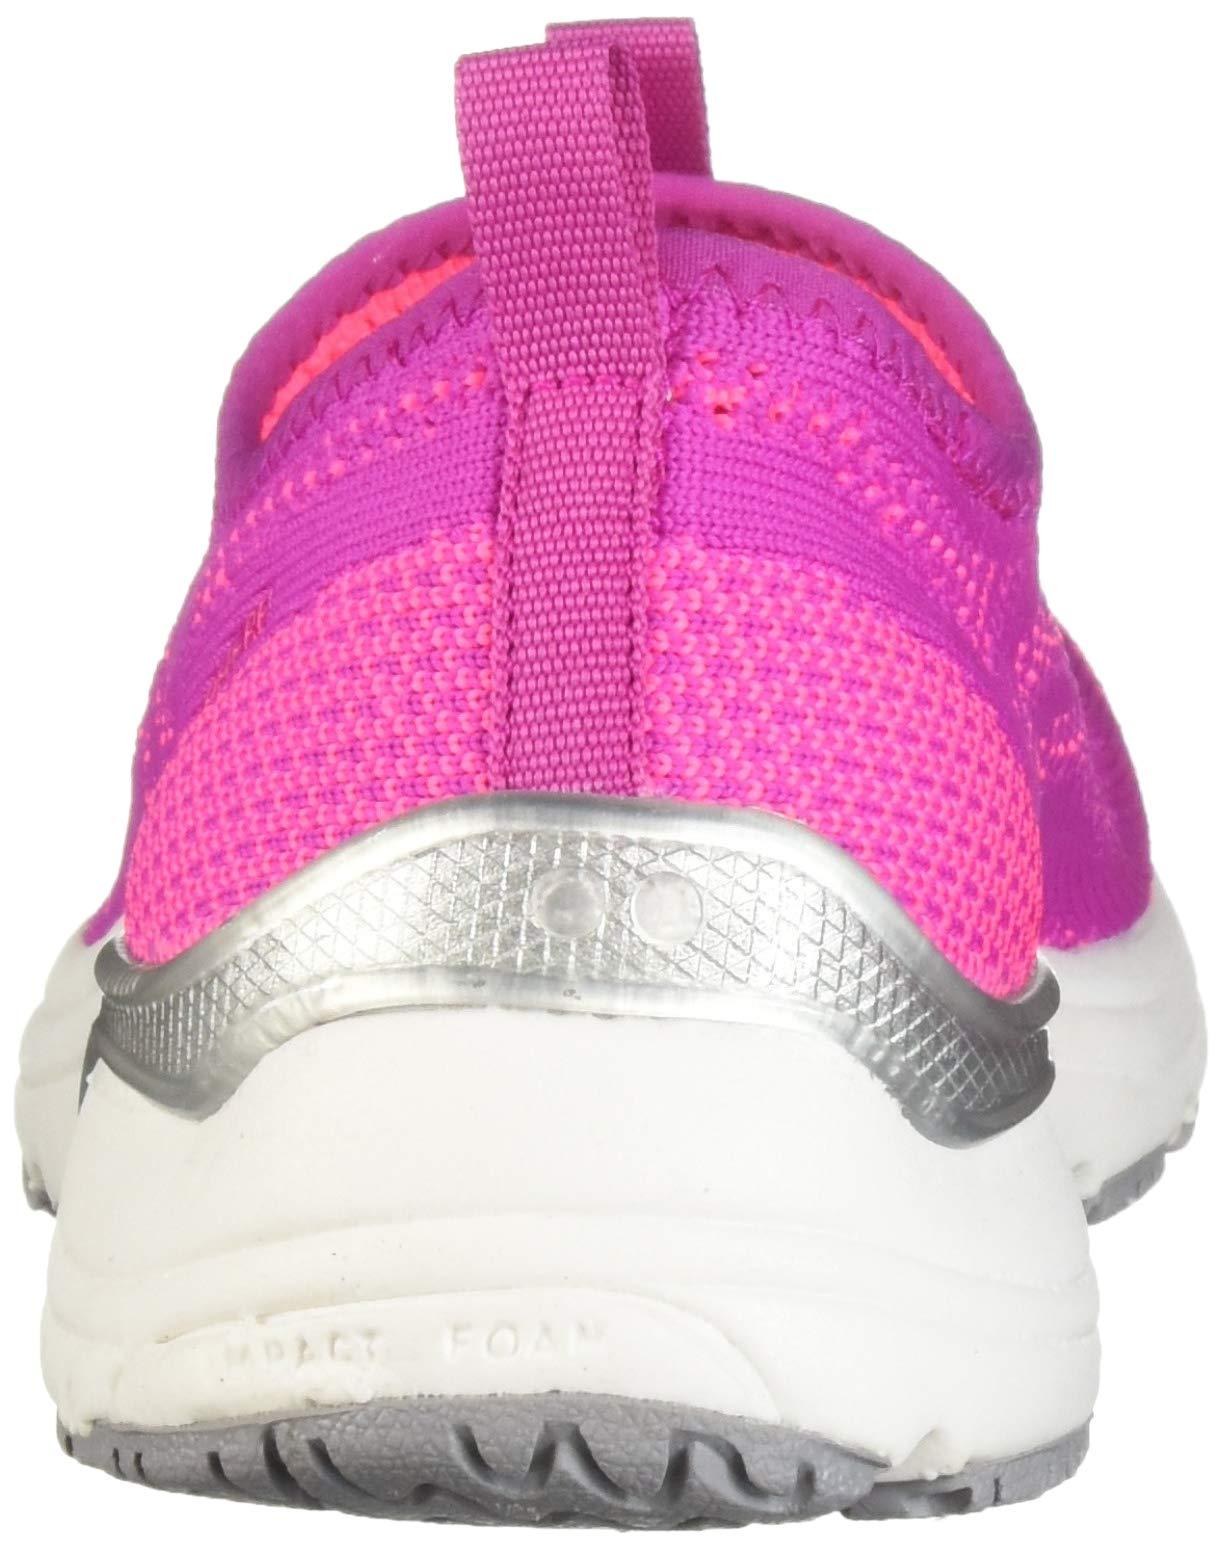 Ryka Women's Hydrosphere Cross Trainer, Bougainvilliea/Hyper Pink/Sconce Grey, 6.5 M US by Ryka (Image #2)